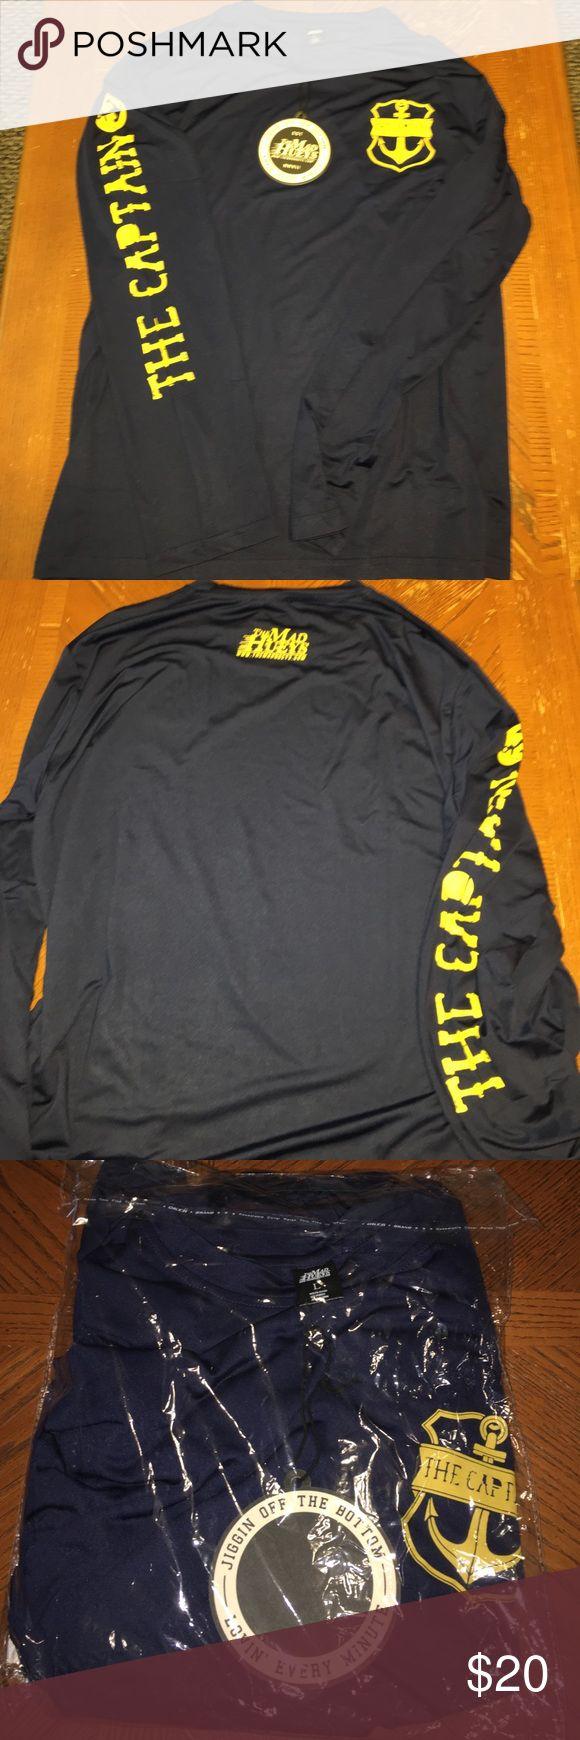 The Mad Huey's long sleeve T shirt NWT The Mad Huey's long sleeve shirt. Navy Blue and Yellow. The Mad Huey's Shirts Tees - Long Sleeve